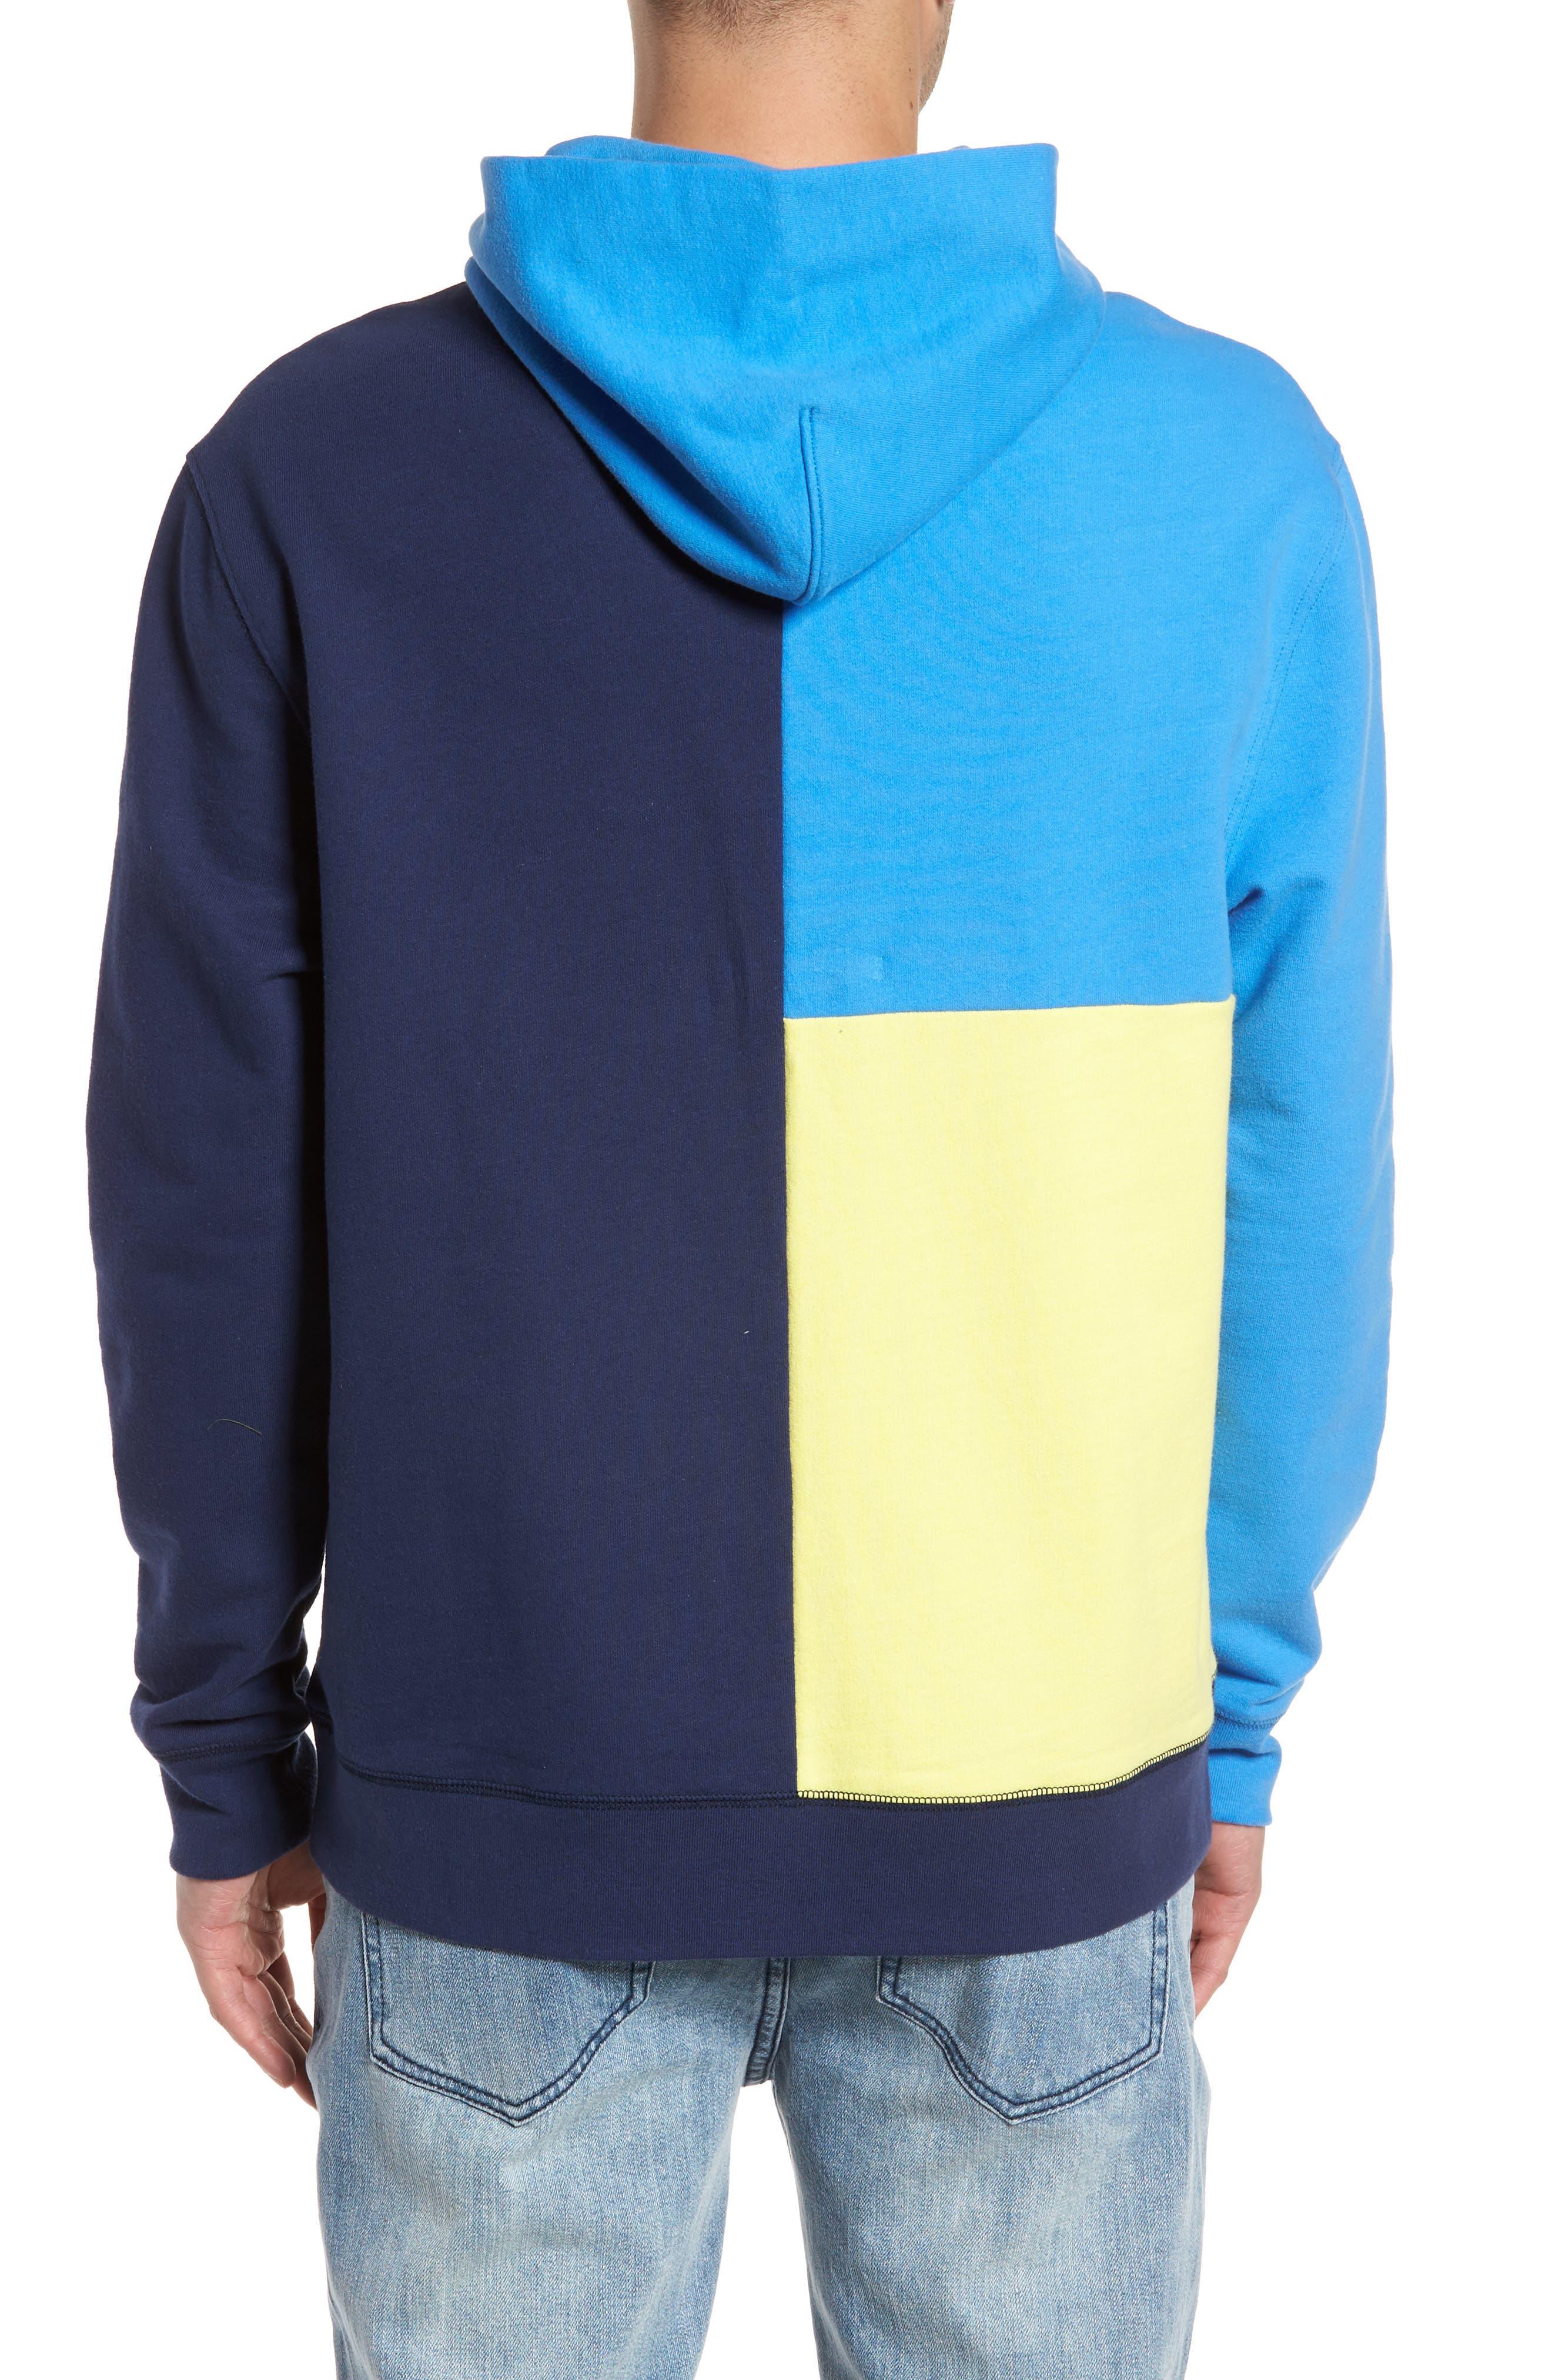 Colorblock Hoodie Sweatshirt,                             Alternate thumbnail 2, color,                             Navy Blue Yellow Block